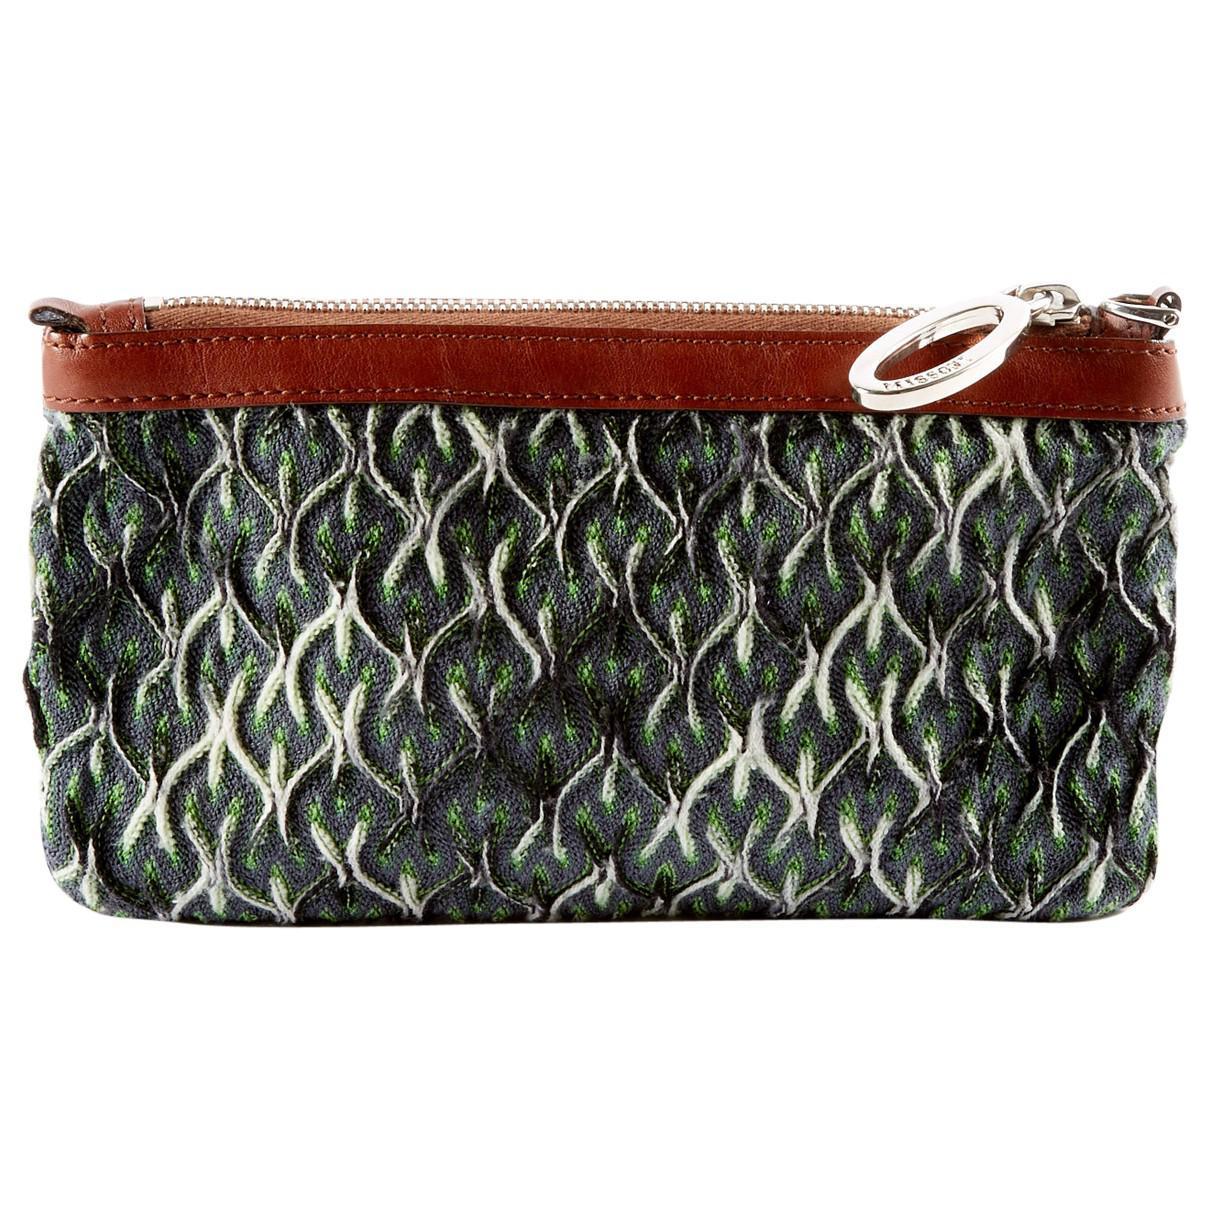 Pre-owned - Wool clutch bag Missoni czJ7BapY